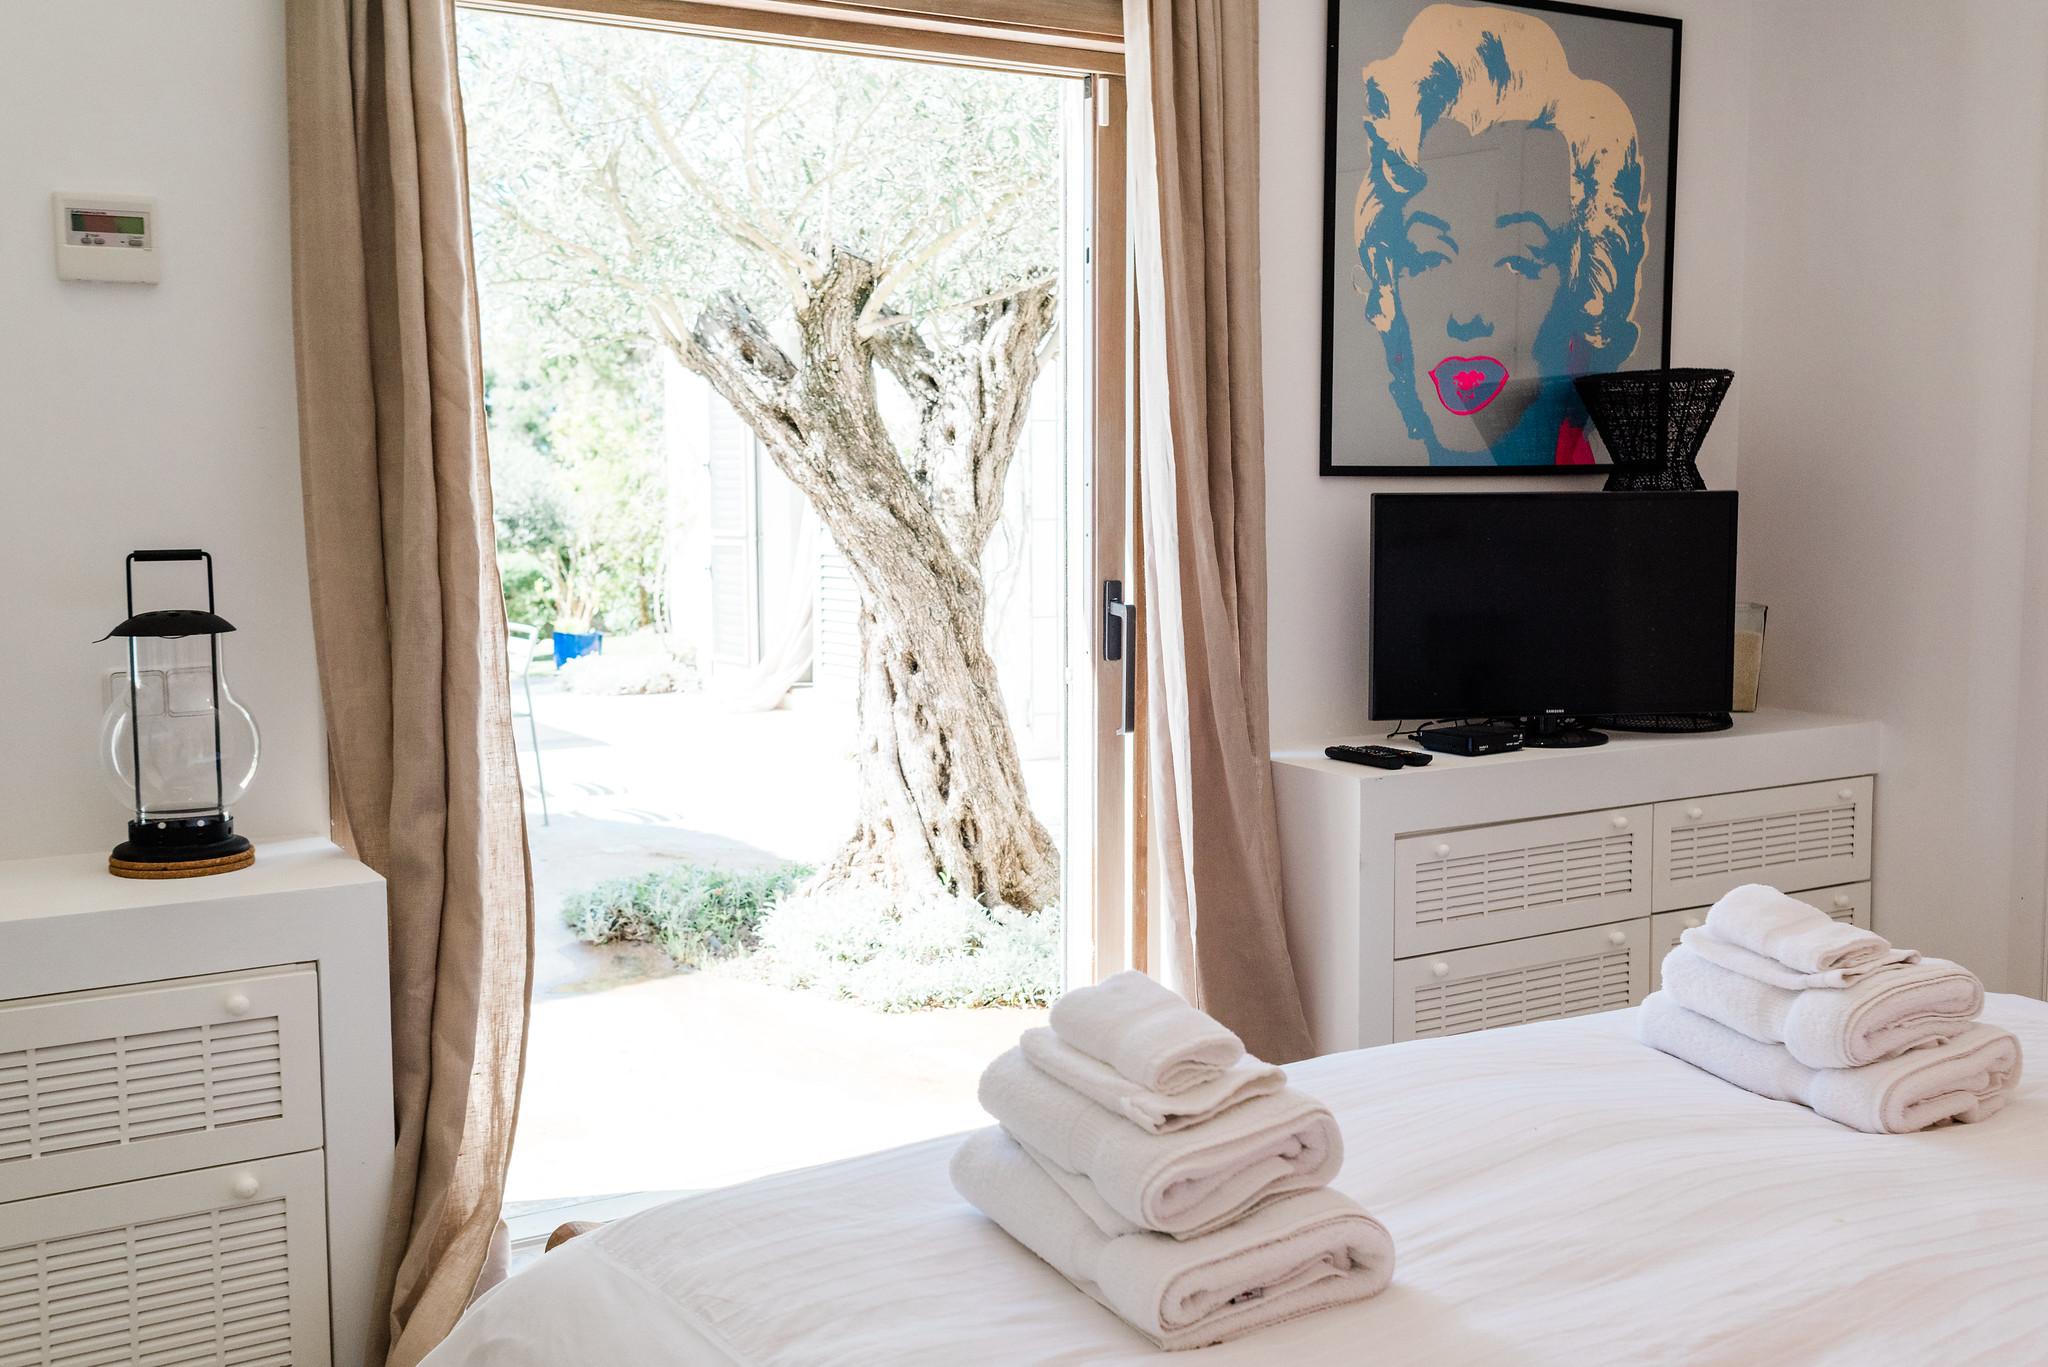 https://www.white-ibiza.com/wp-content/uploads/2020/06/white-ibiza-villas-casa-nyah-interior-bedroom.jpg